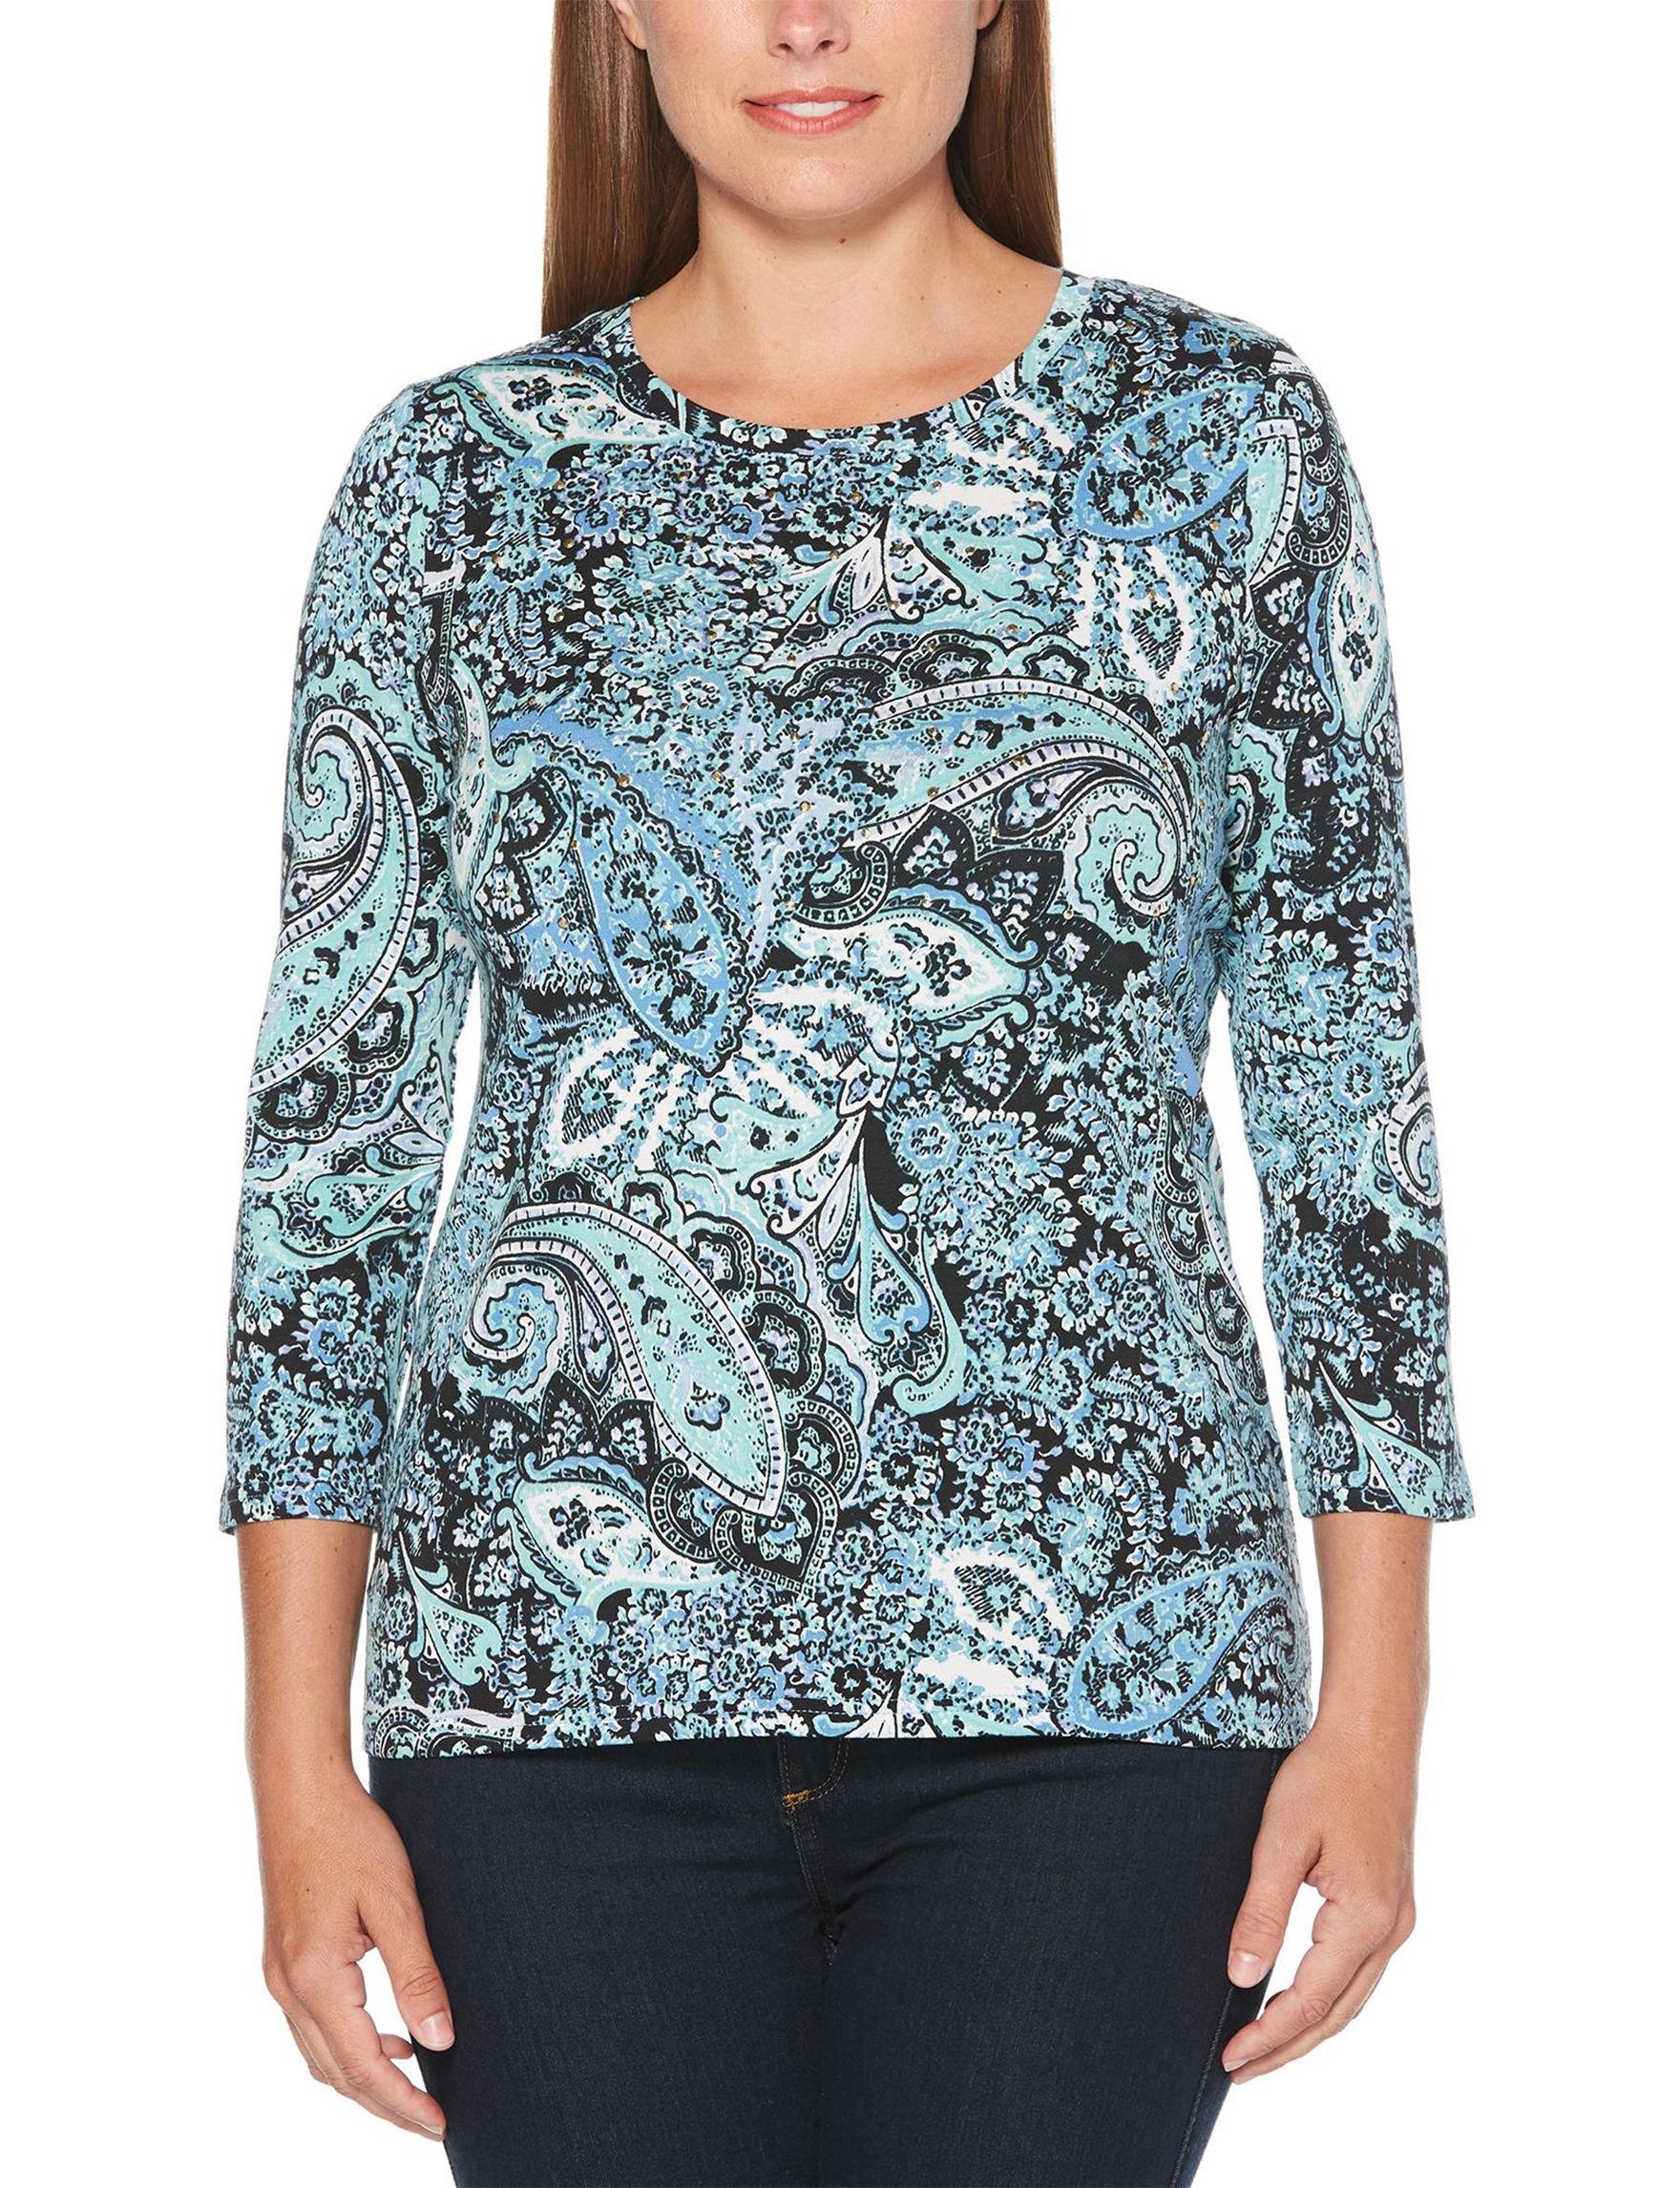 Rafaella Blue Shirts & Blouses Tees & Tanks